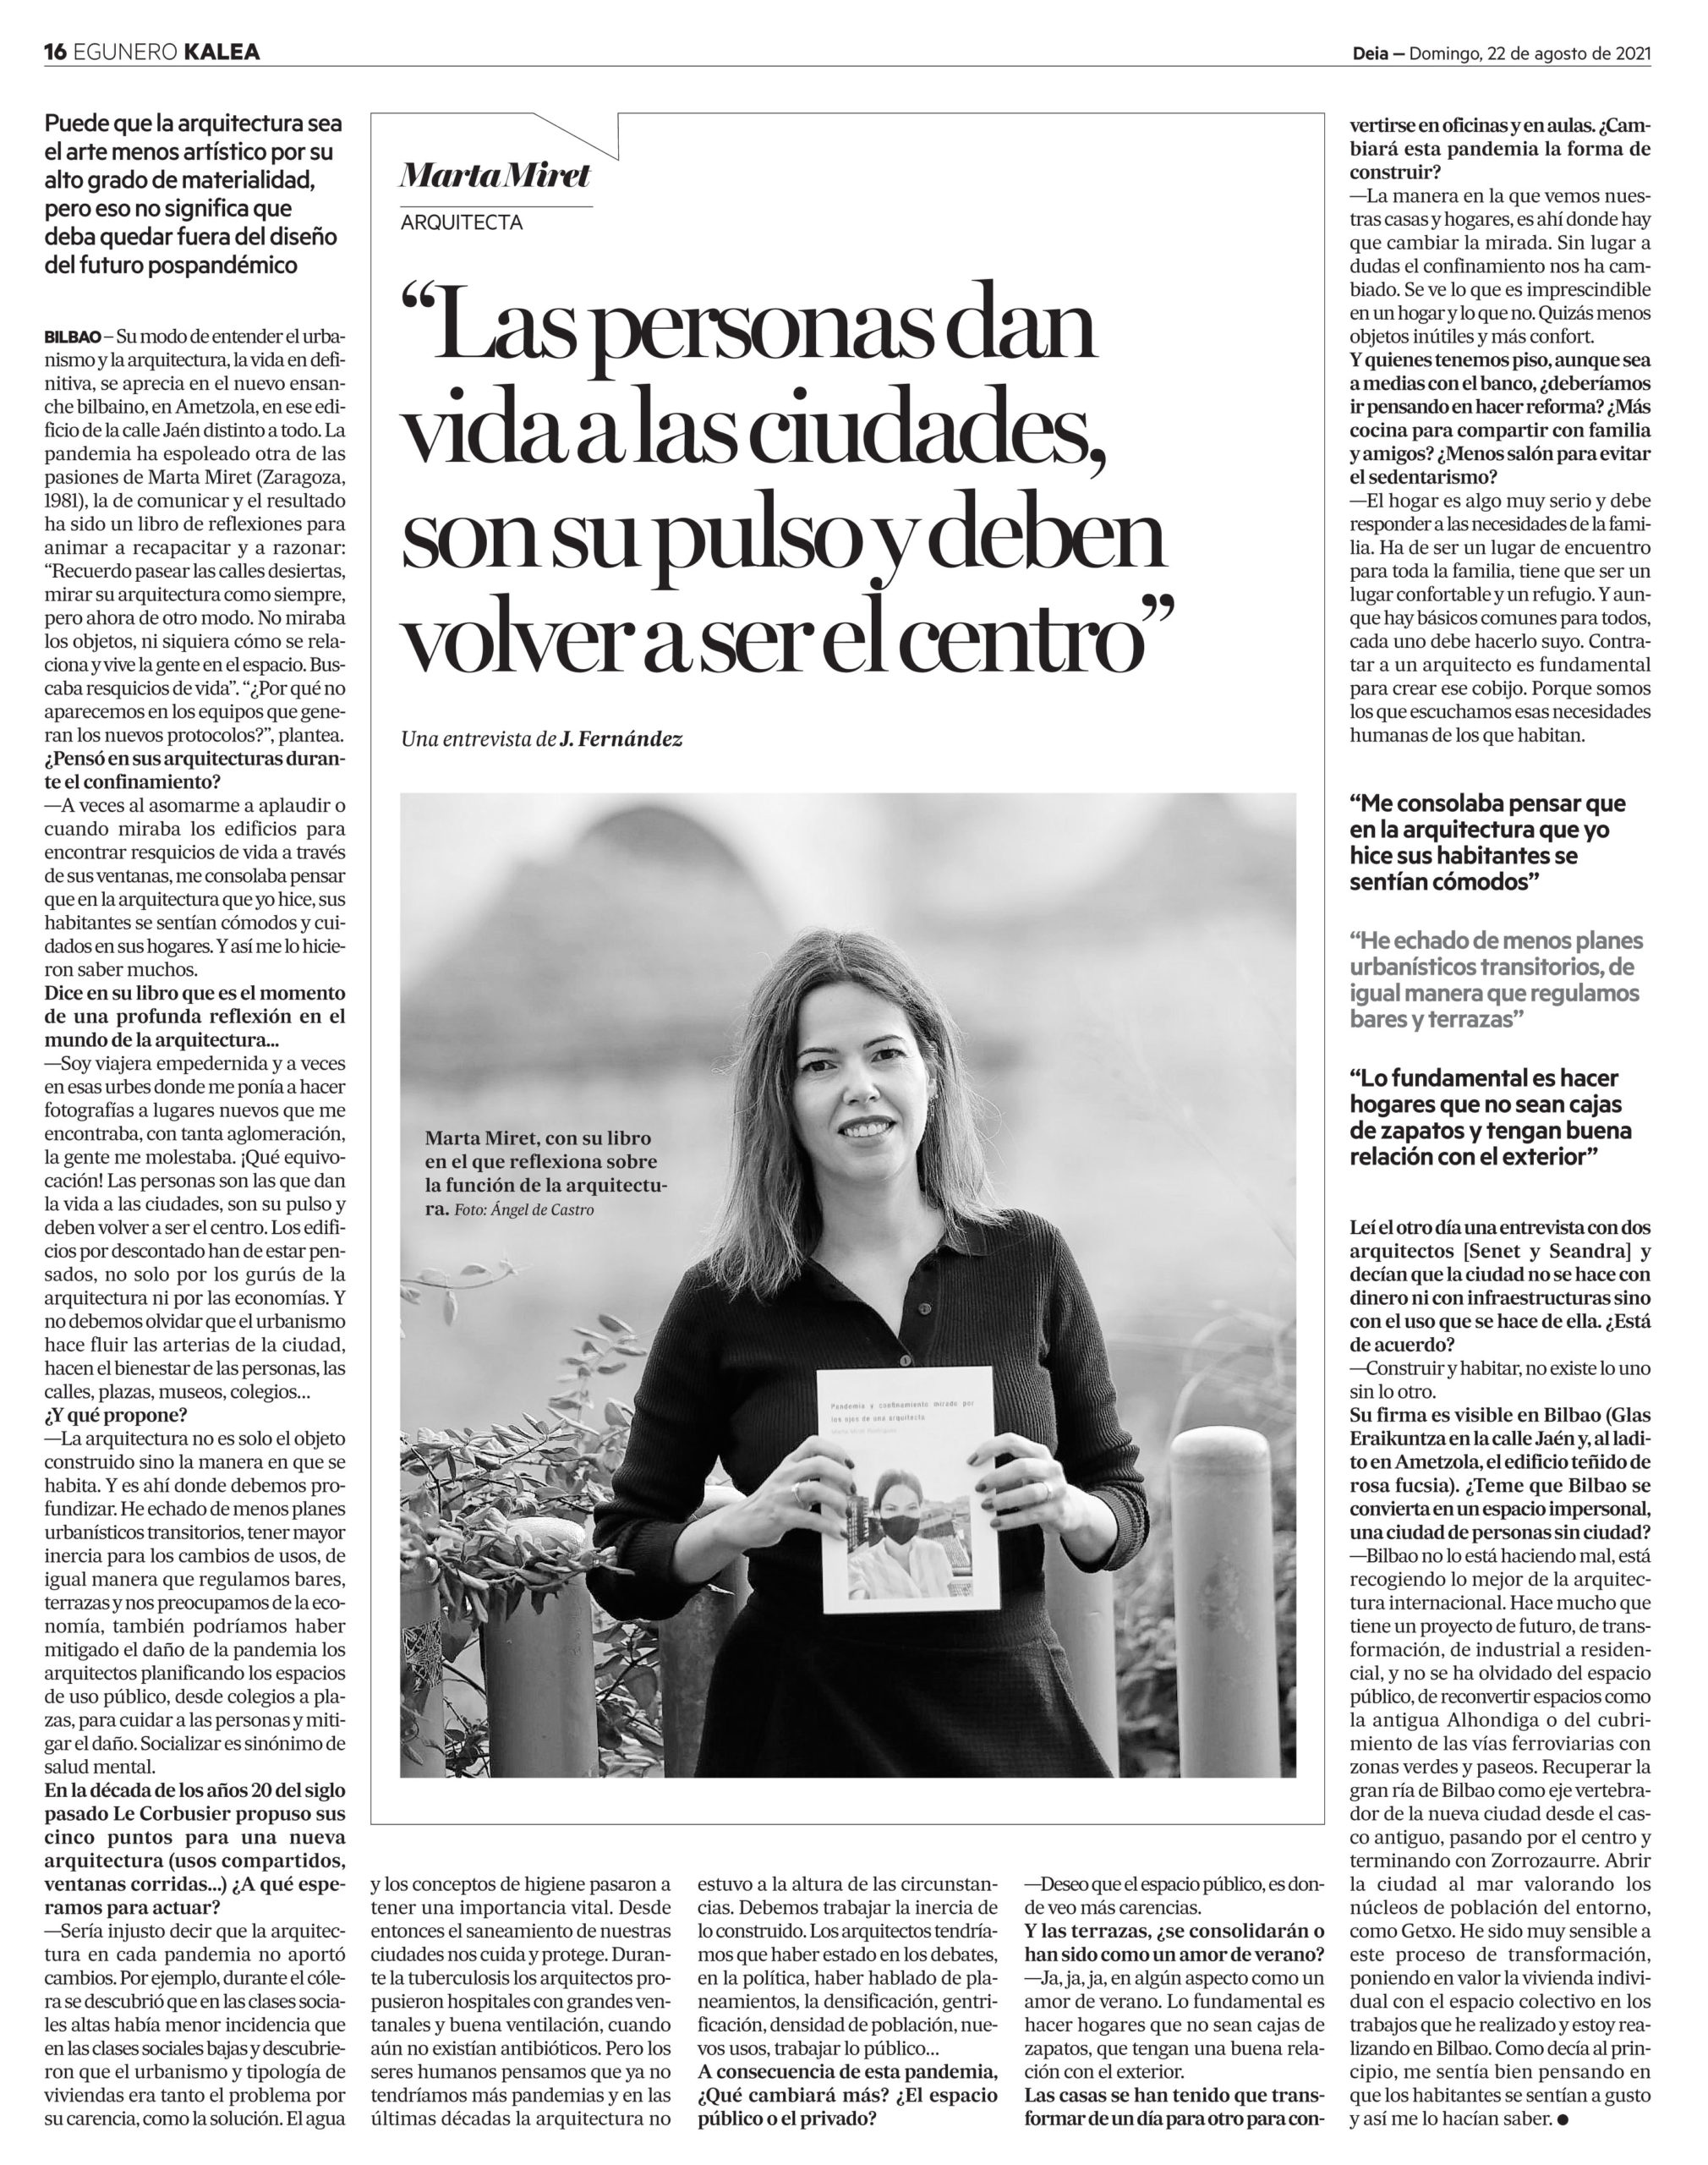 Entrevista arquitecta Marta Miret en Deia